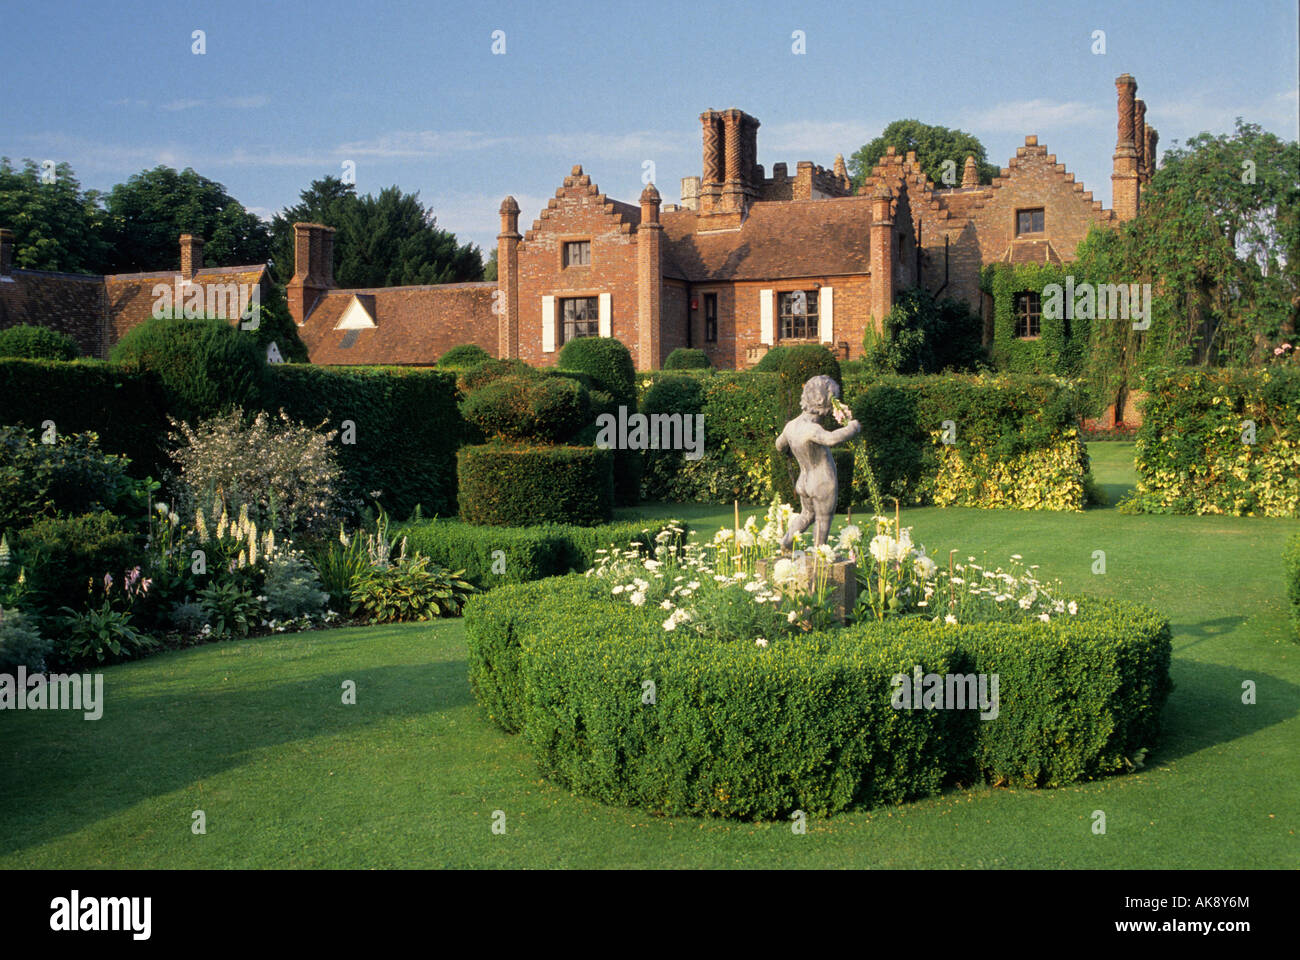 chenies manor buckinghamshire the white garden dahlias yew hedges